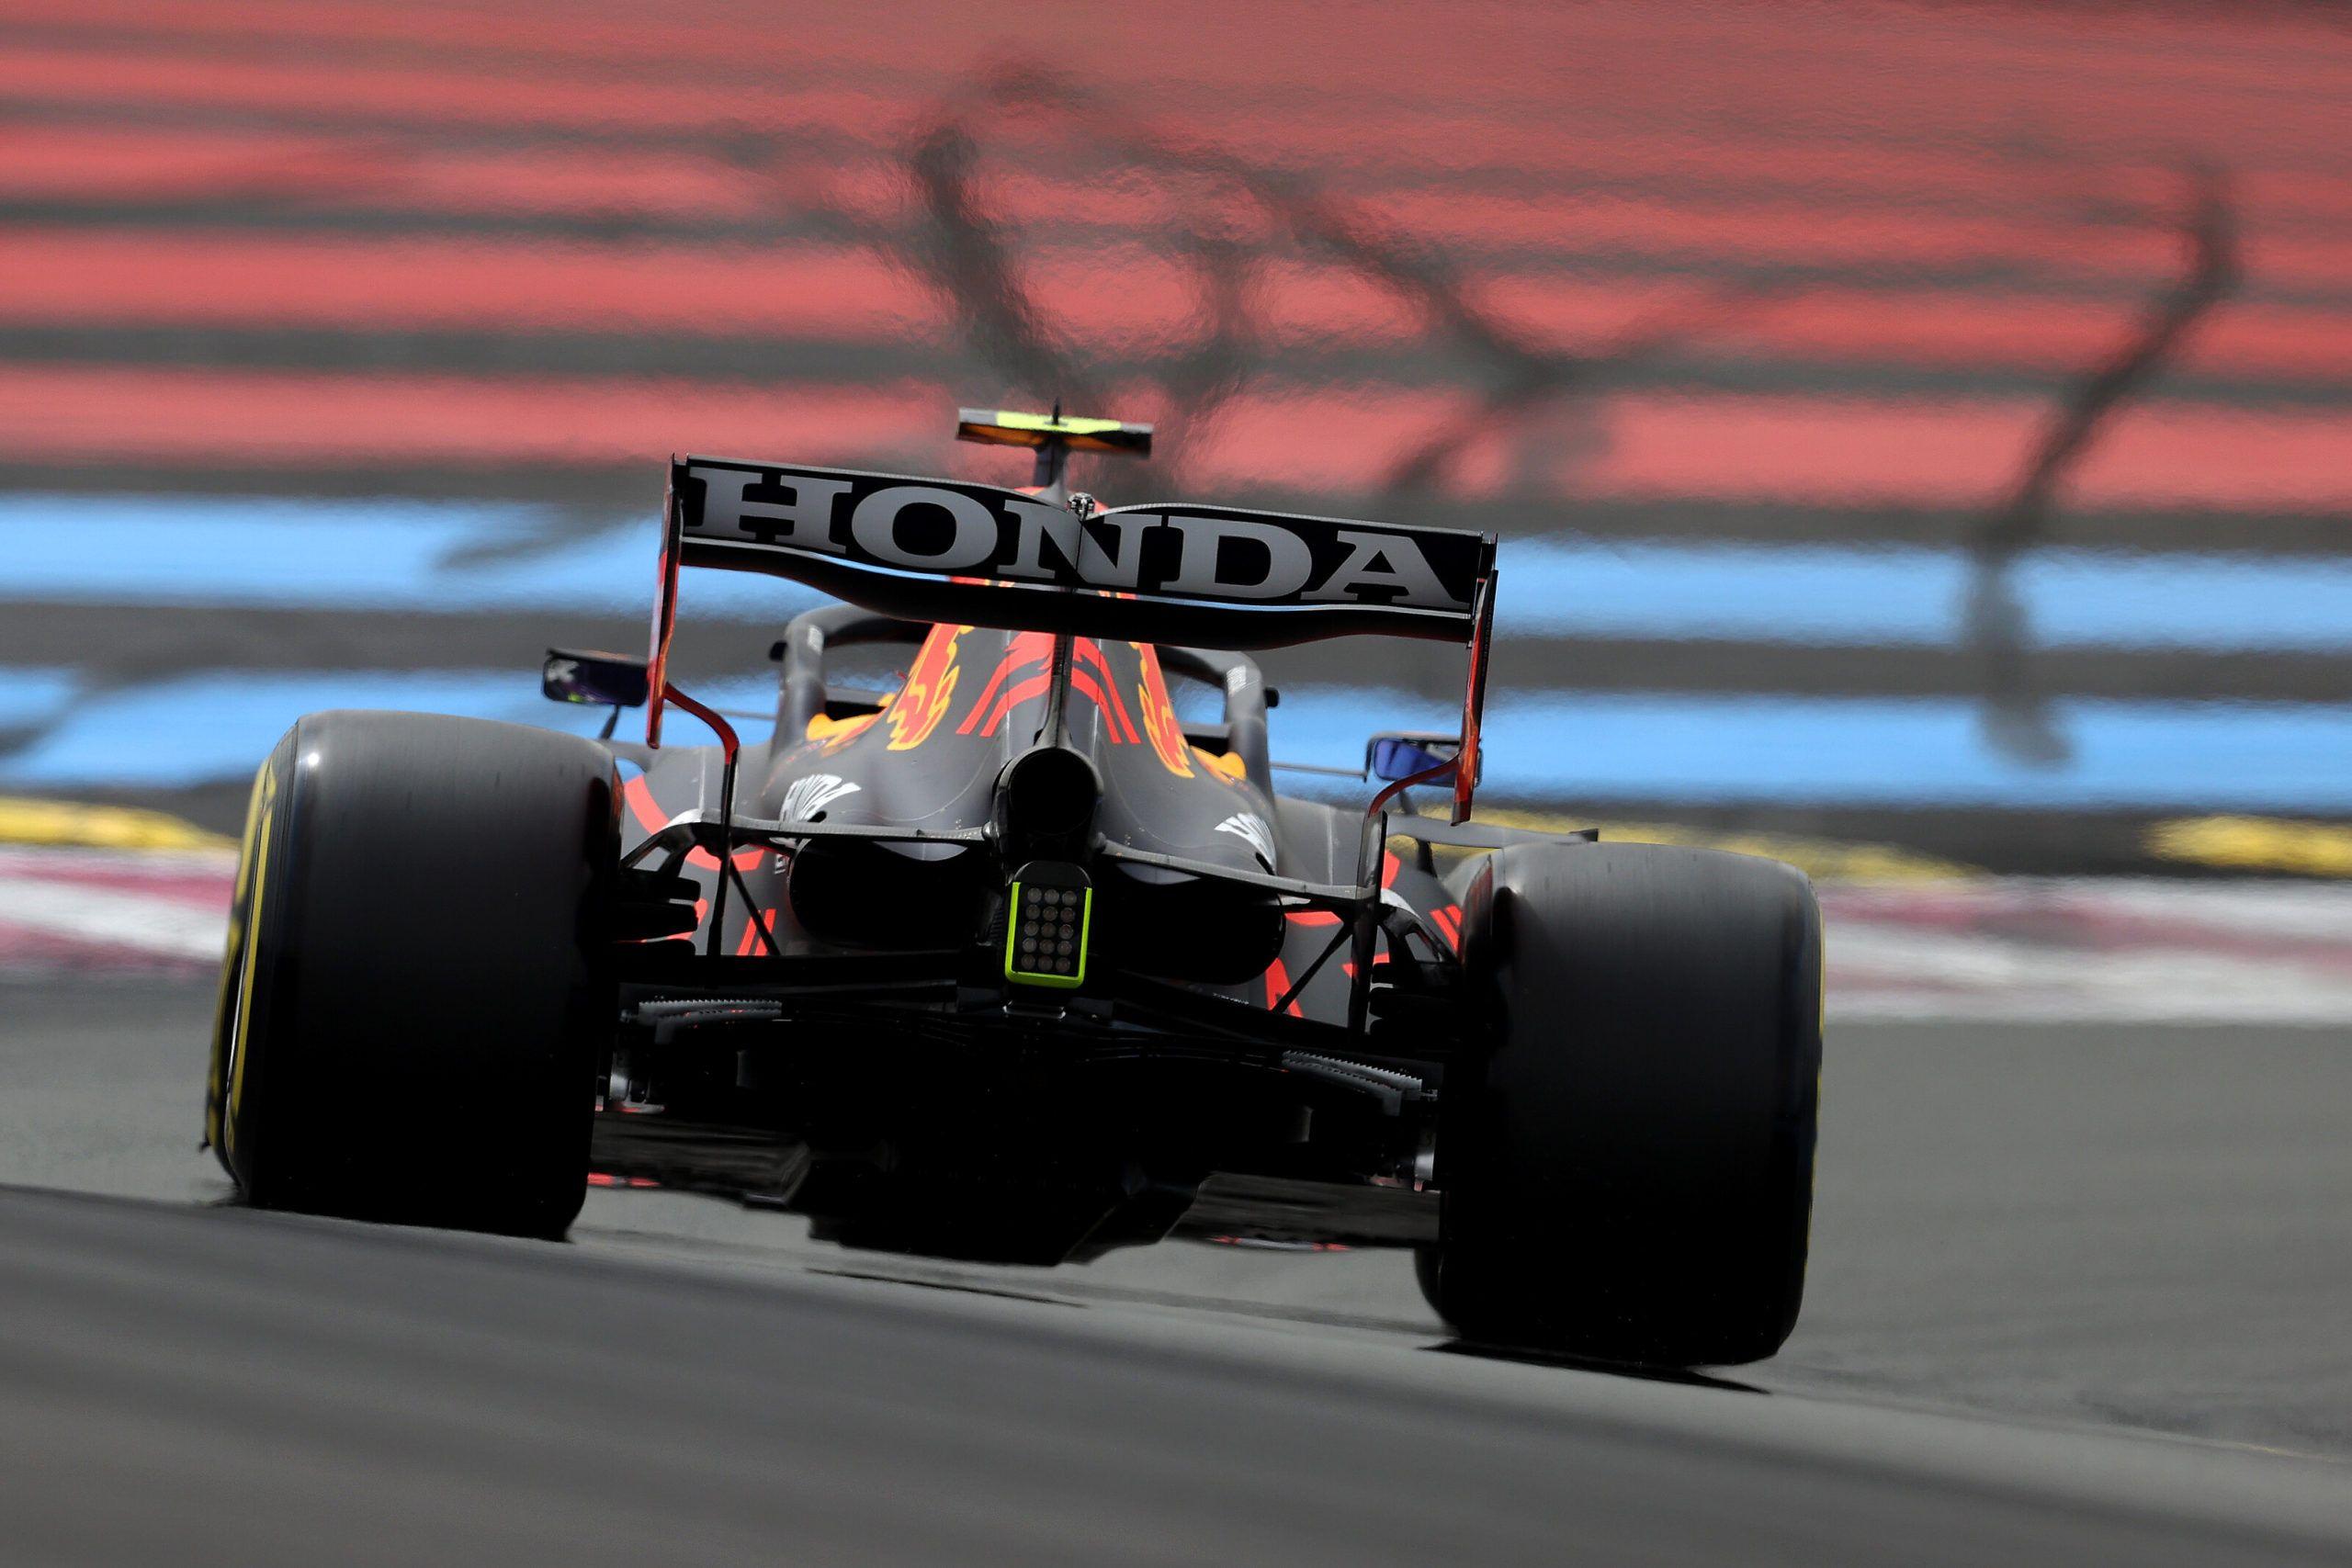 F1, Pirelli, Austria, British GP